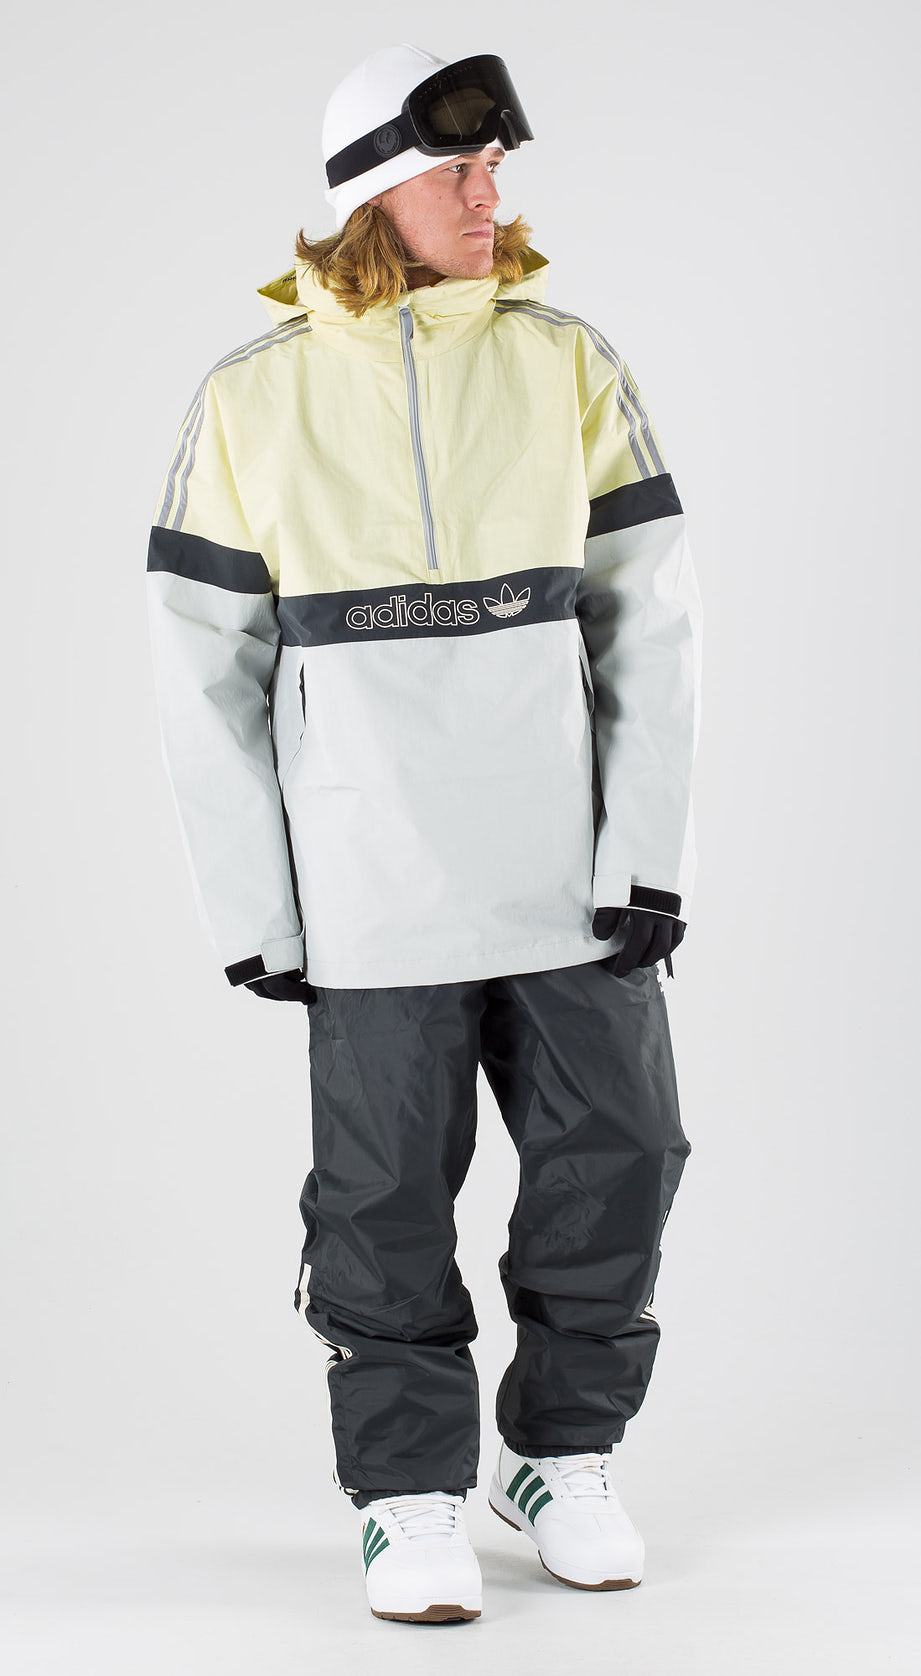 Adidas Snowboarding BB Snowbreaker Haze Yellow/Stone/Carbon Snowboardkläder Multi